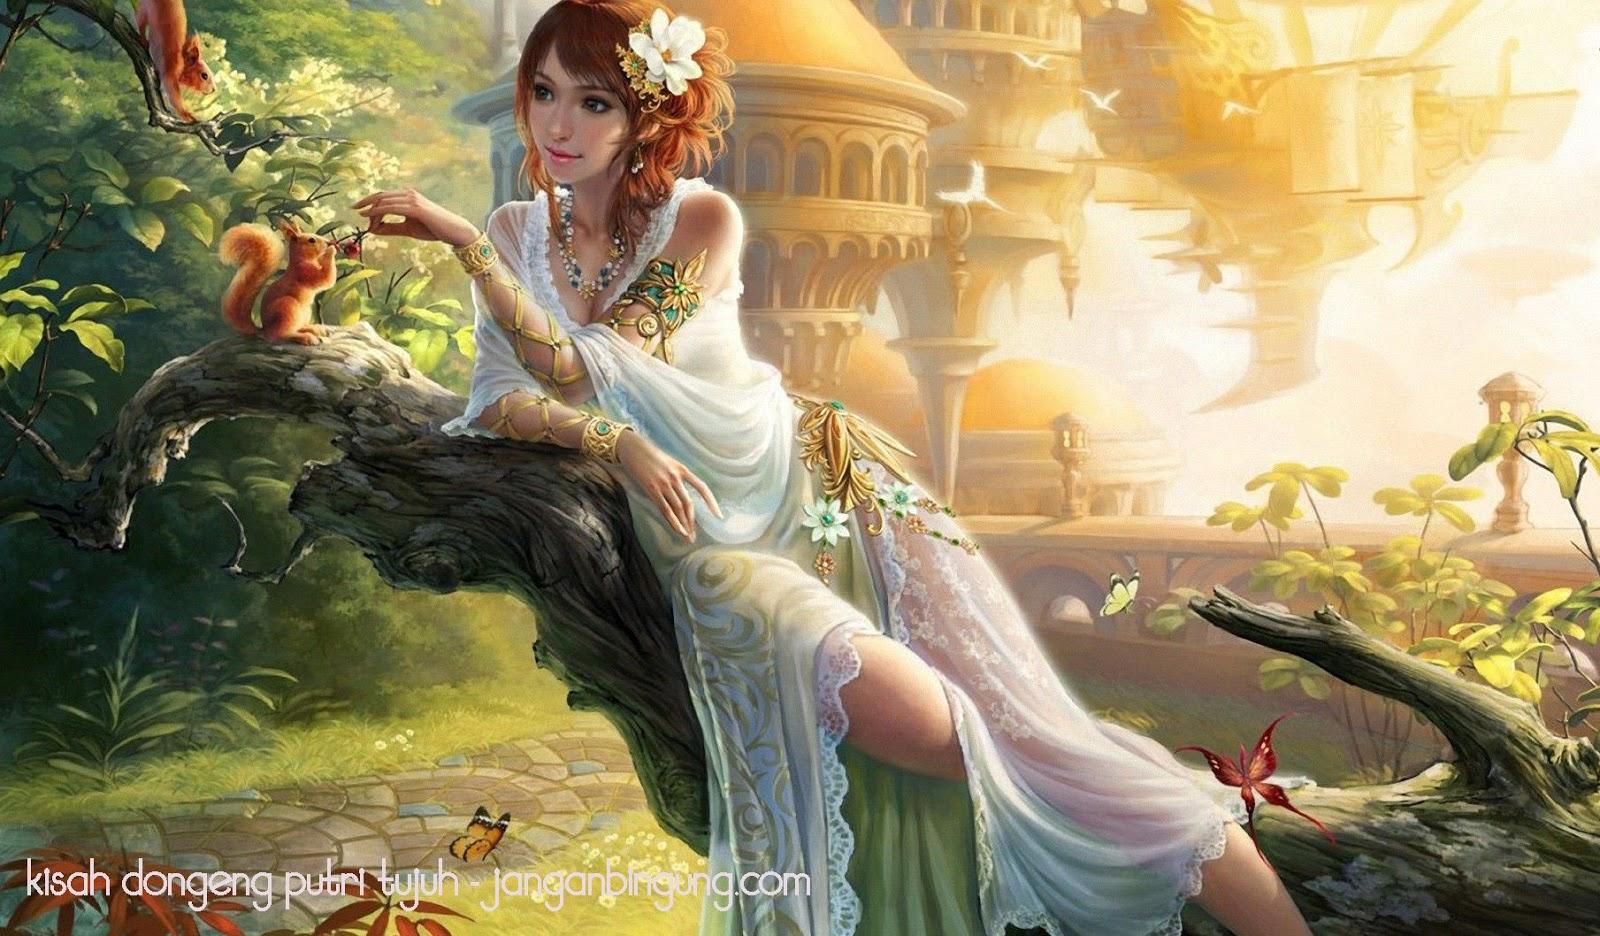 kisah dongeng putri tujuh